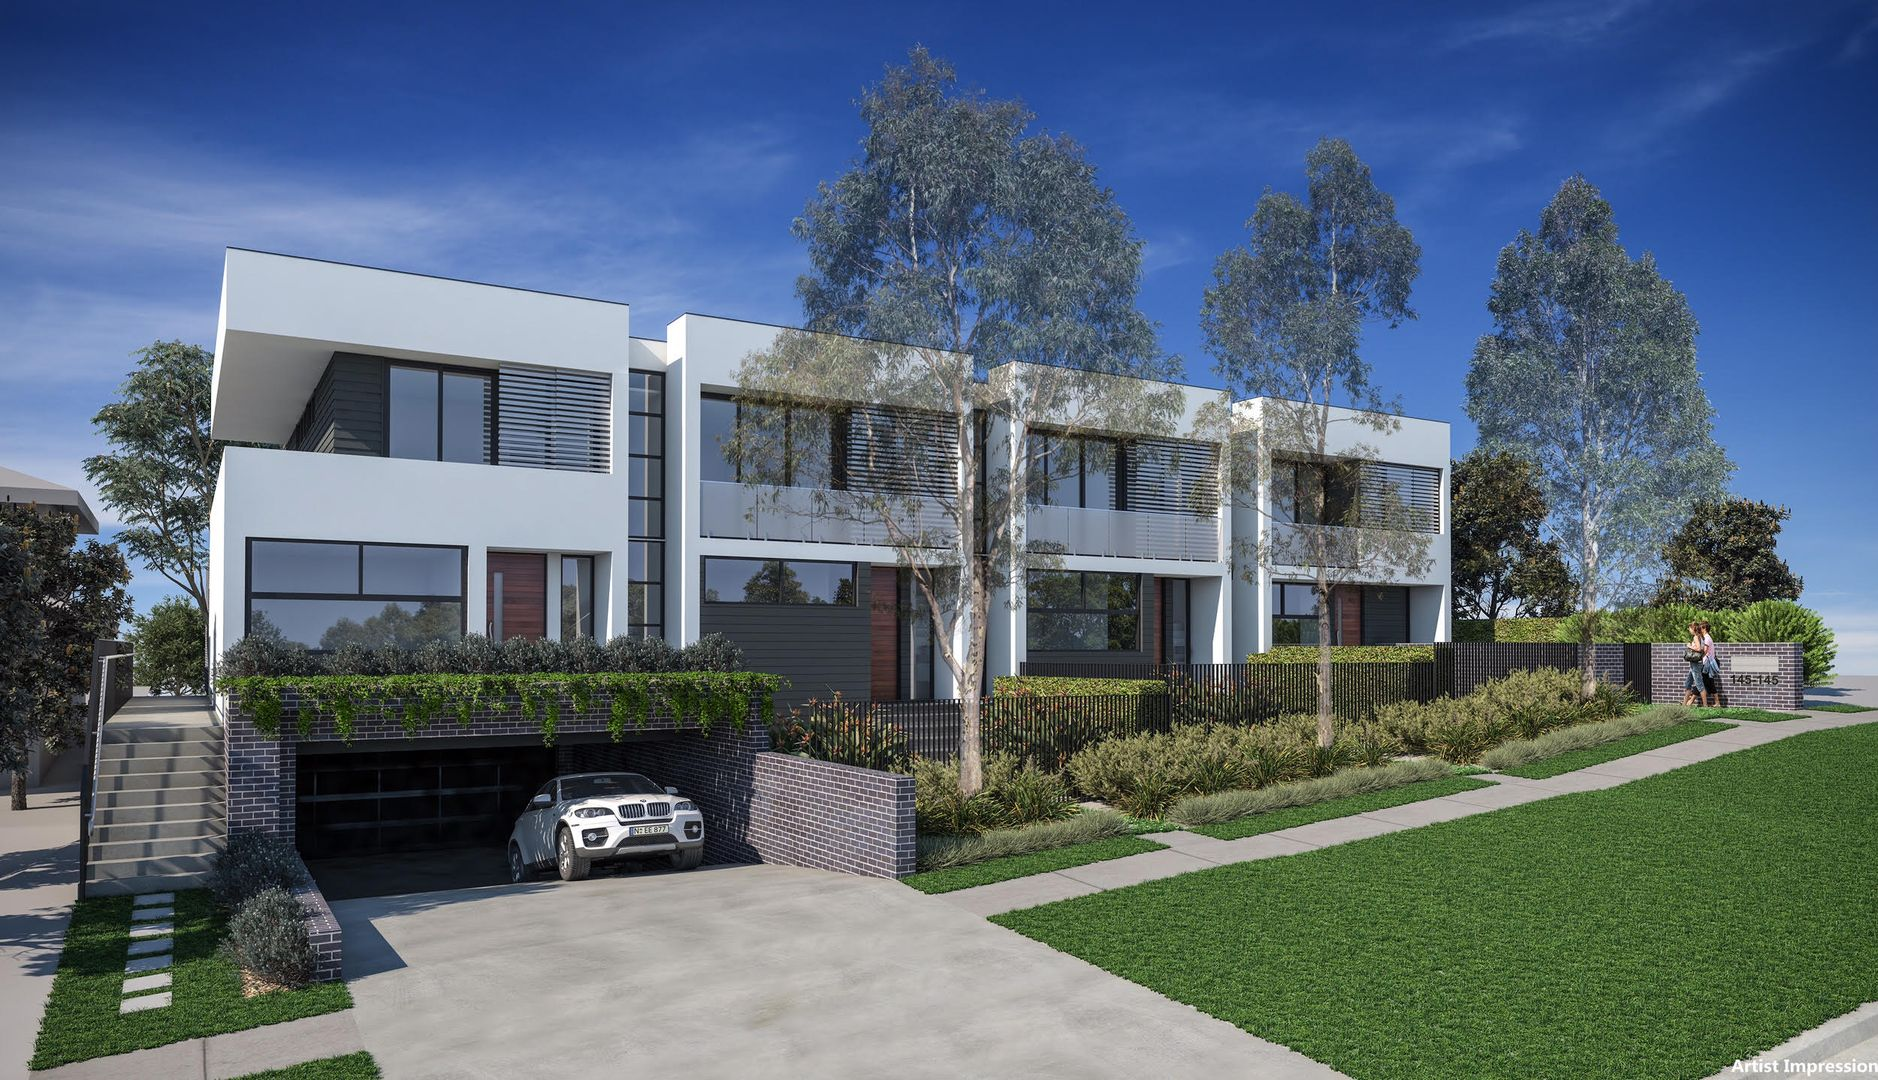 143 - 145 President Avenue, Miranda NSW 2228, Image 0